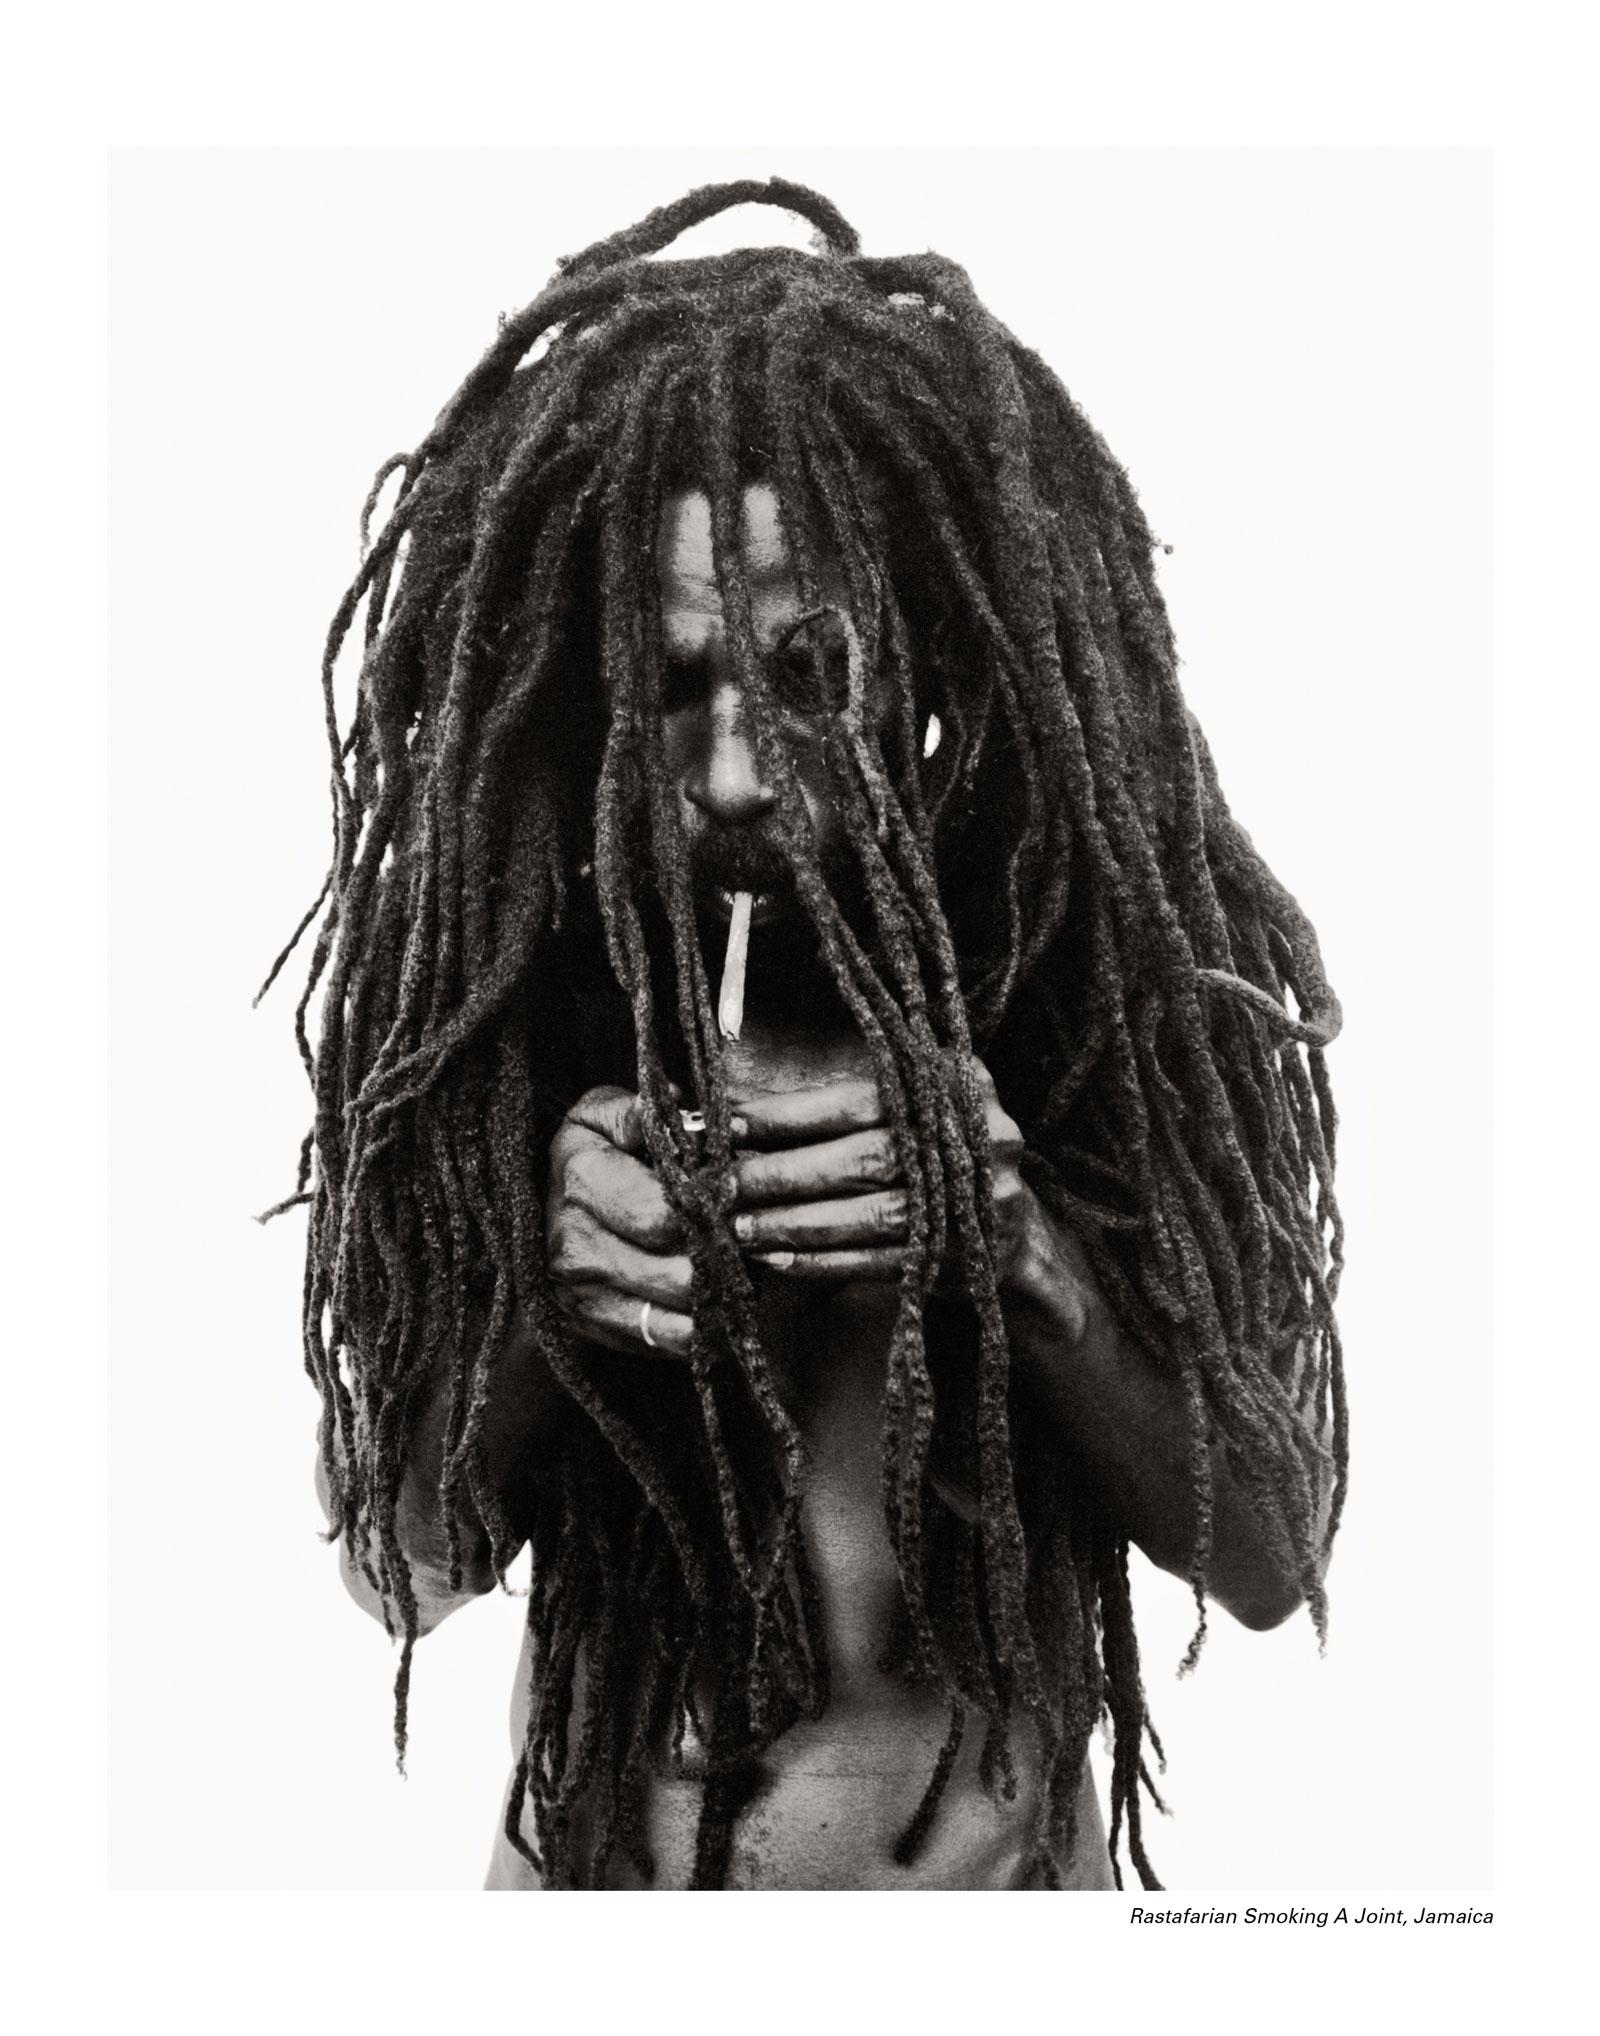 B_Rastafarian_Smoking_A_Joint.jpg